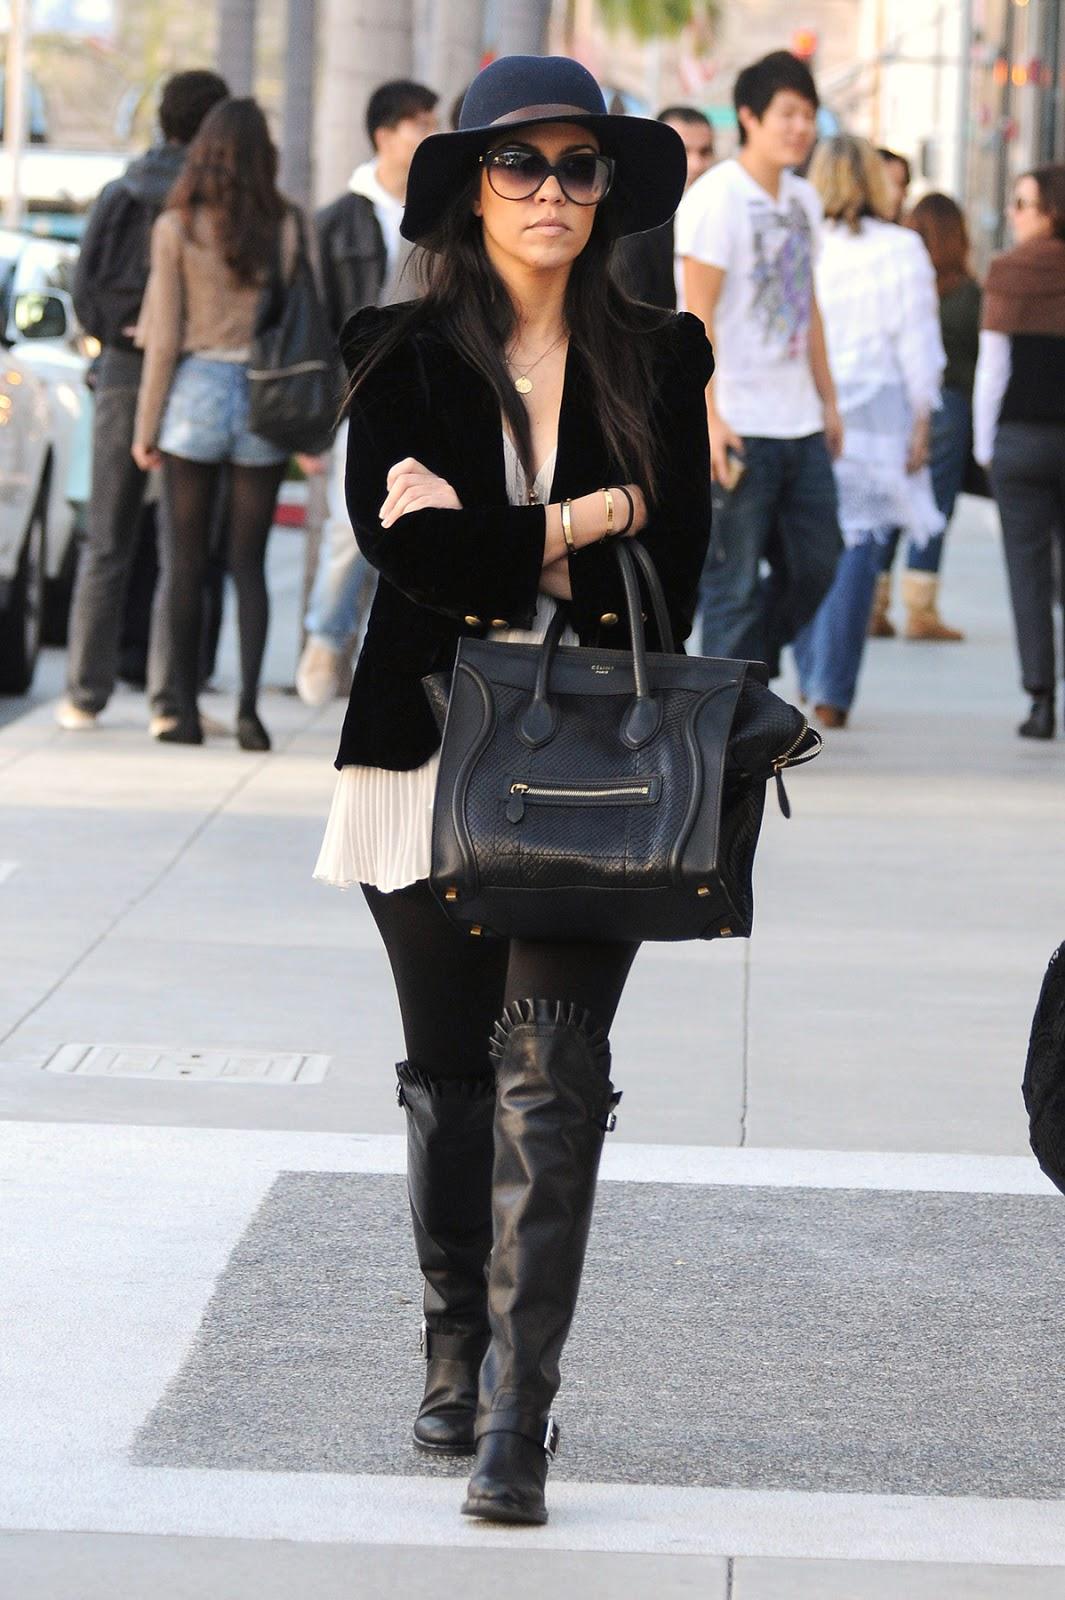 Khloe Kardashian shows off fit figure in skintight dress